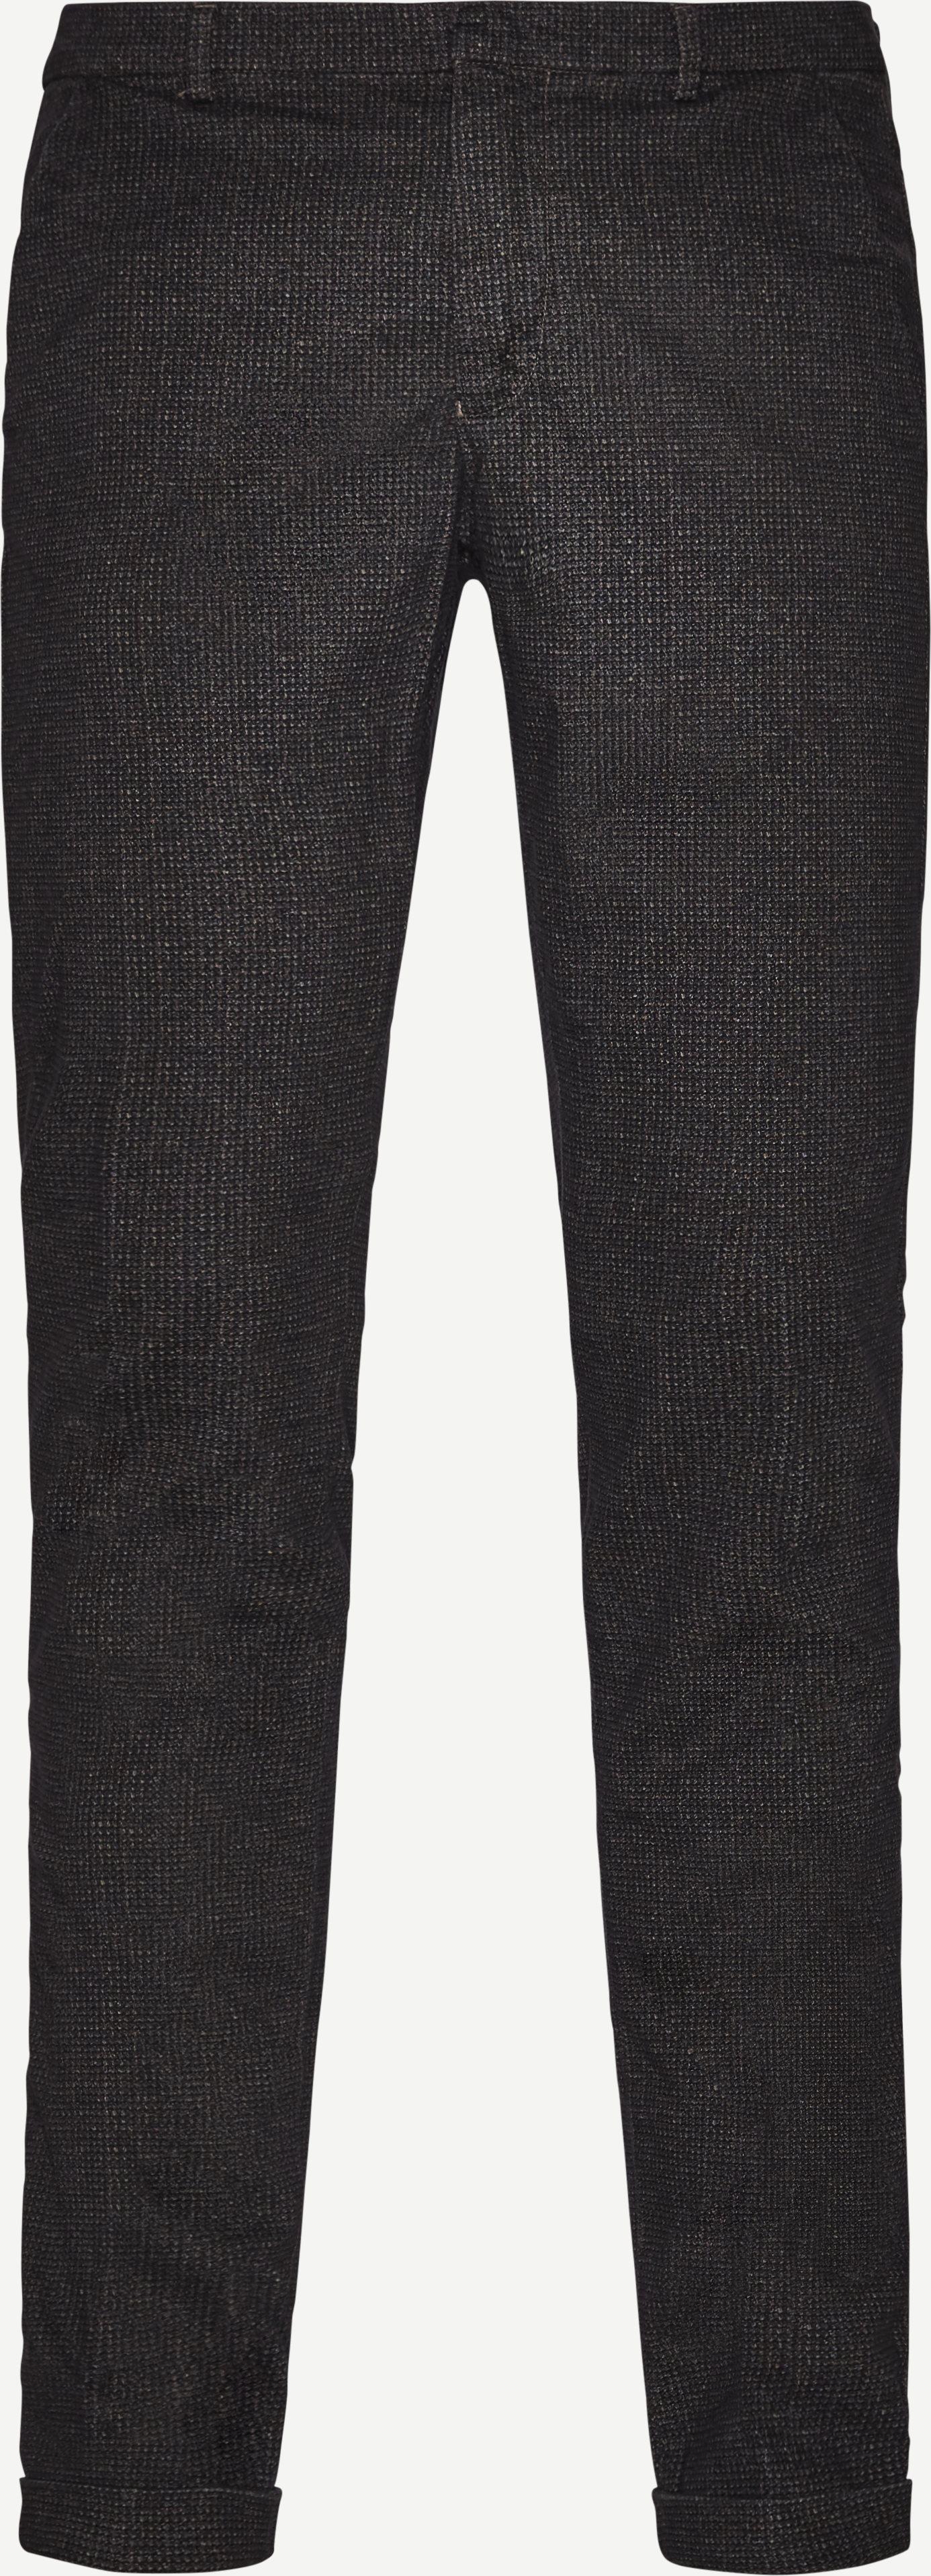 Hosen - Skinny fit - Grau